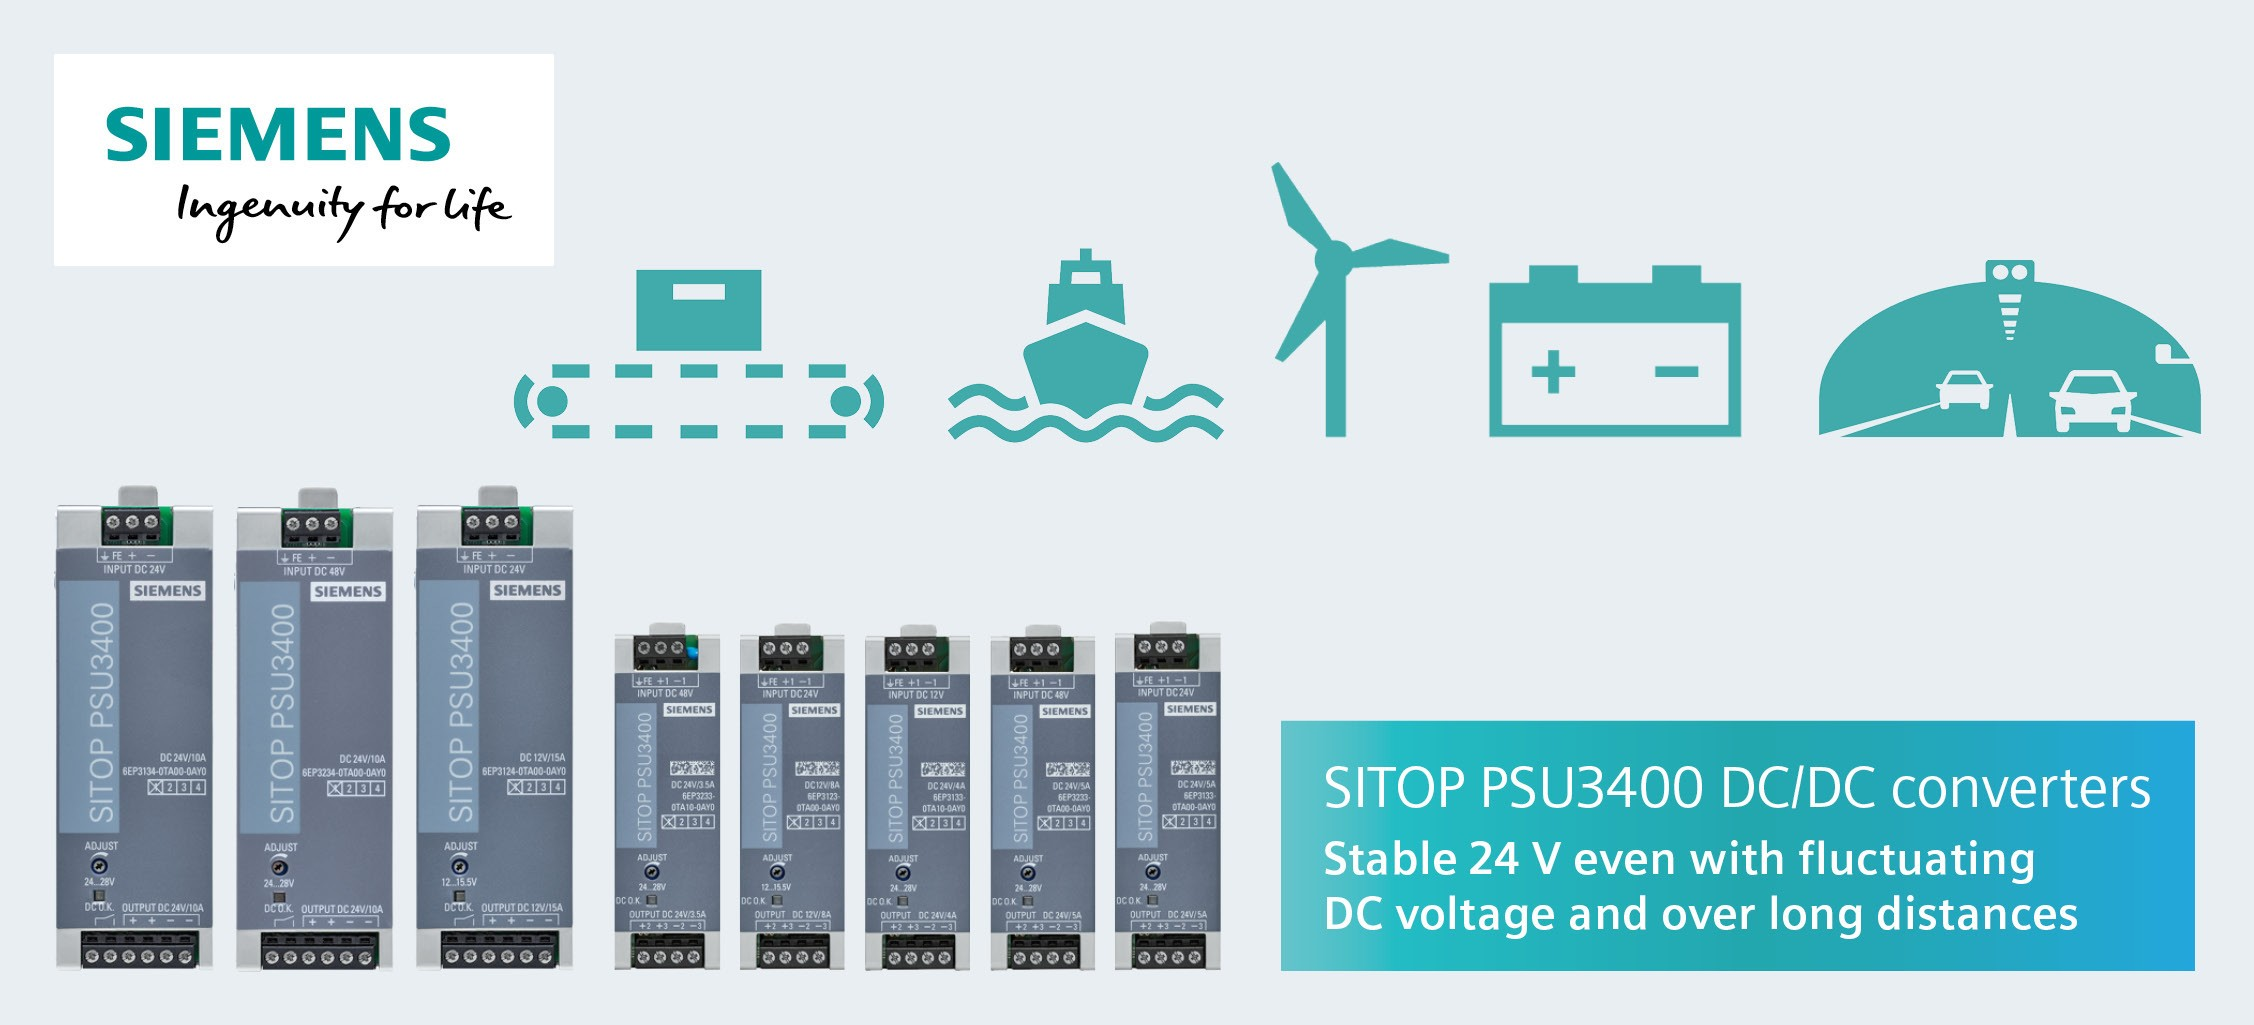 SITOP PSU3400 DC/DC converters